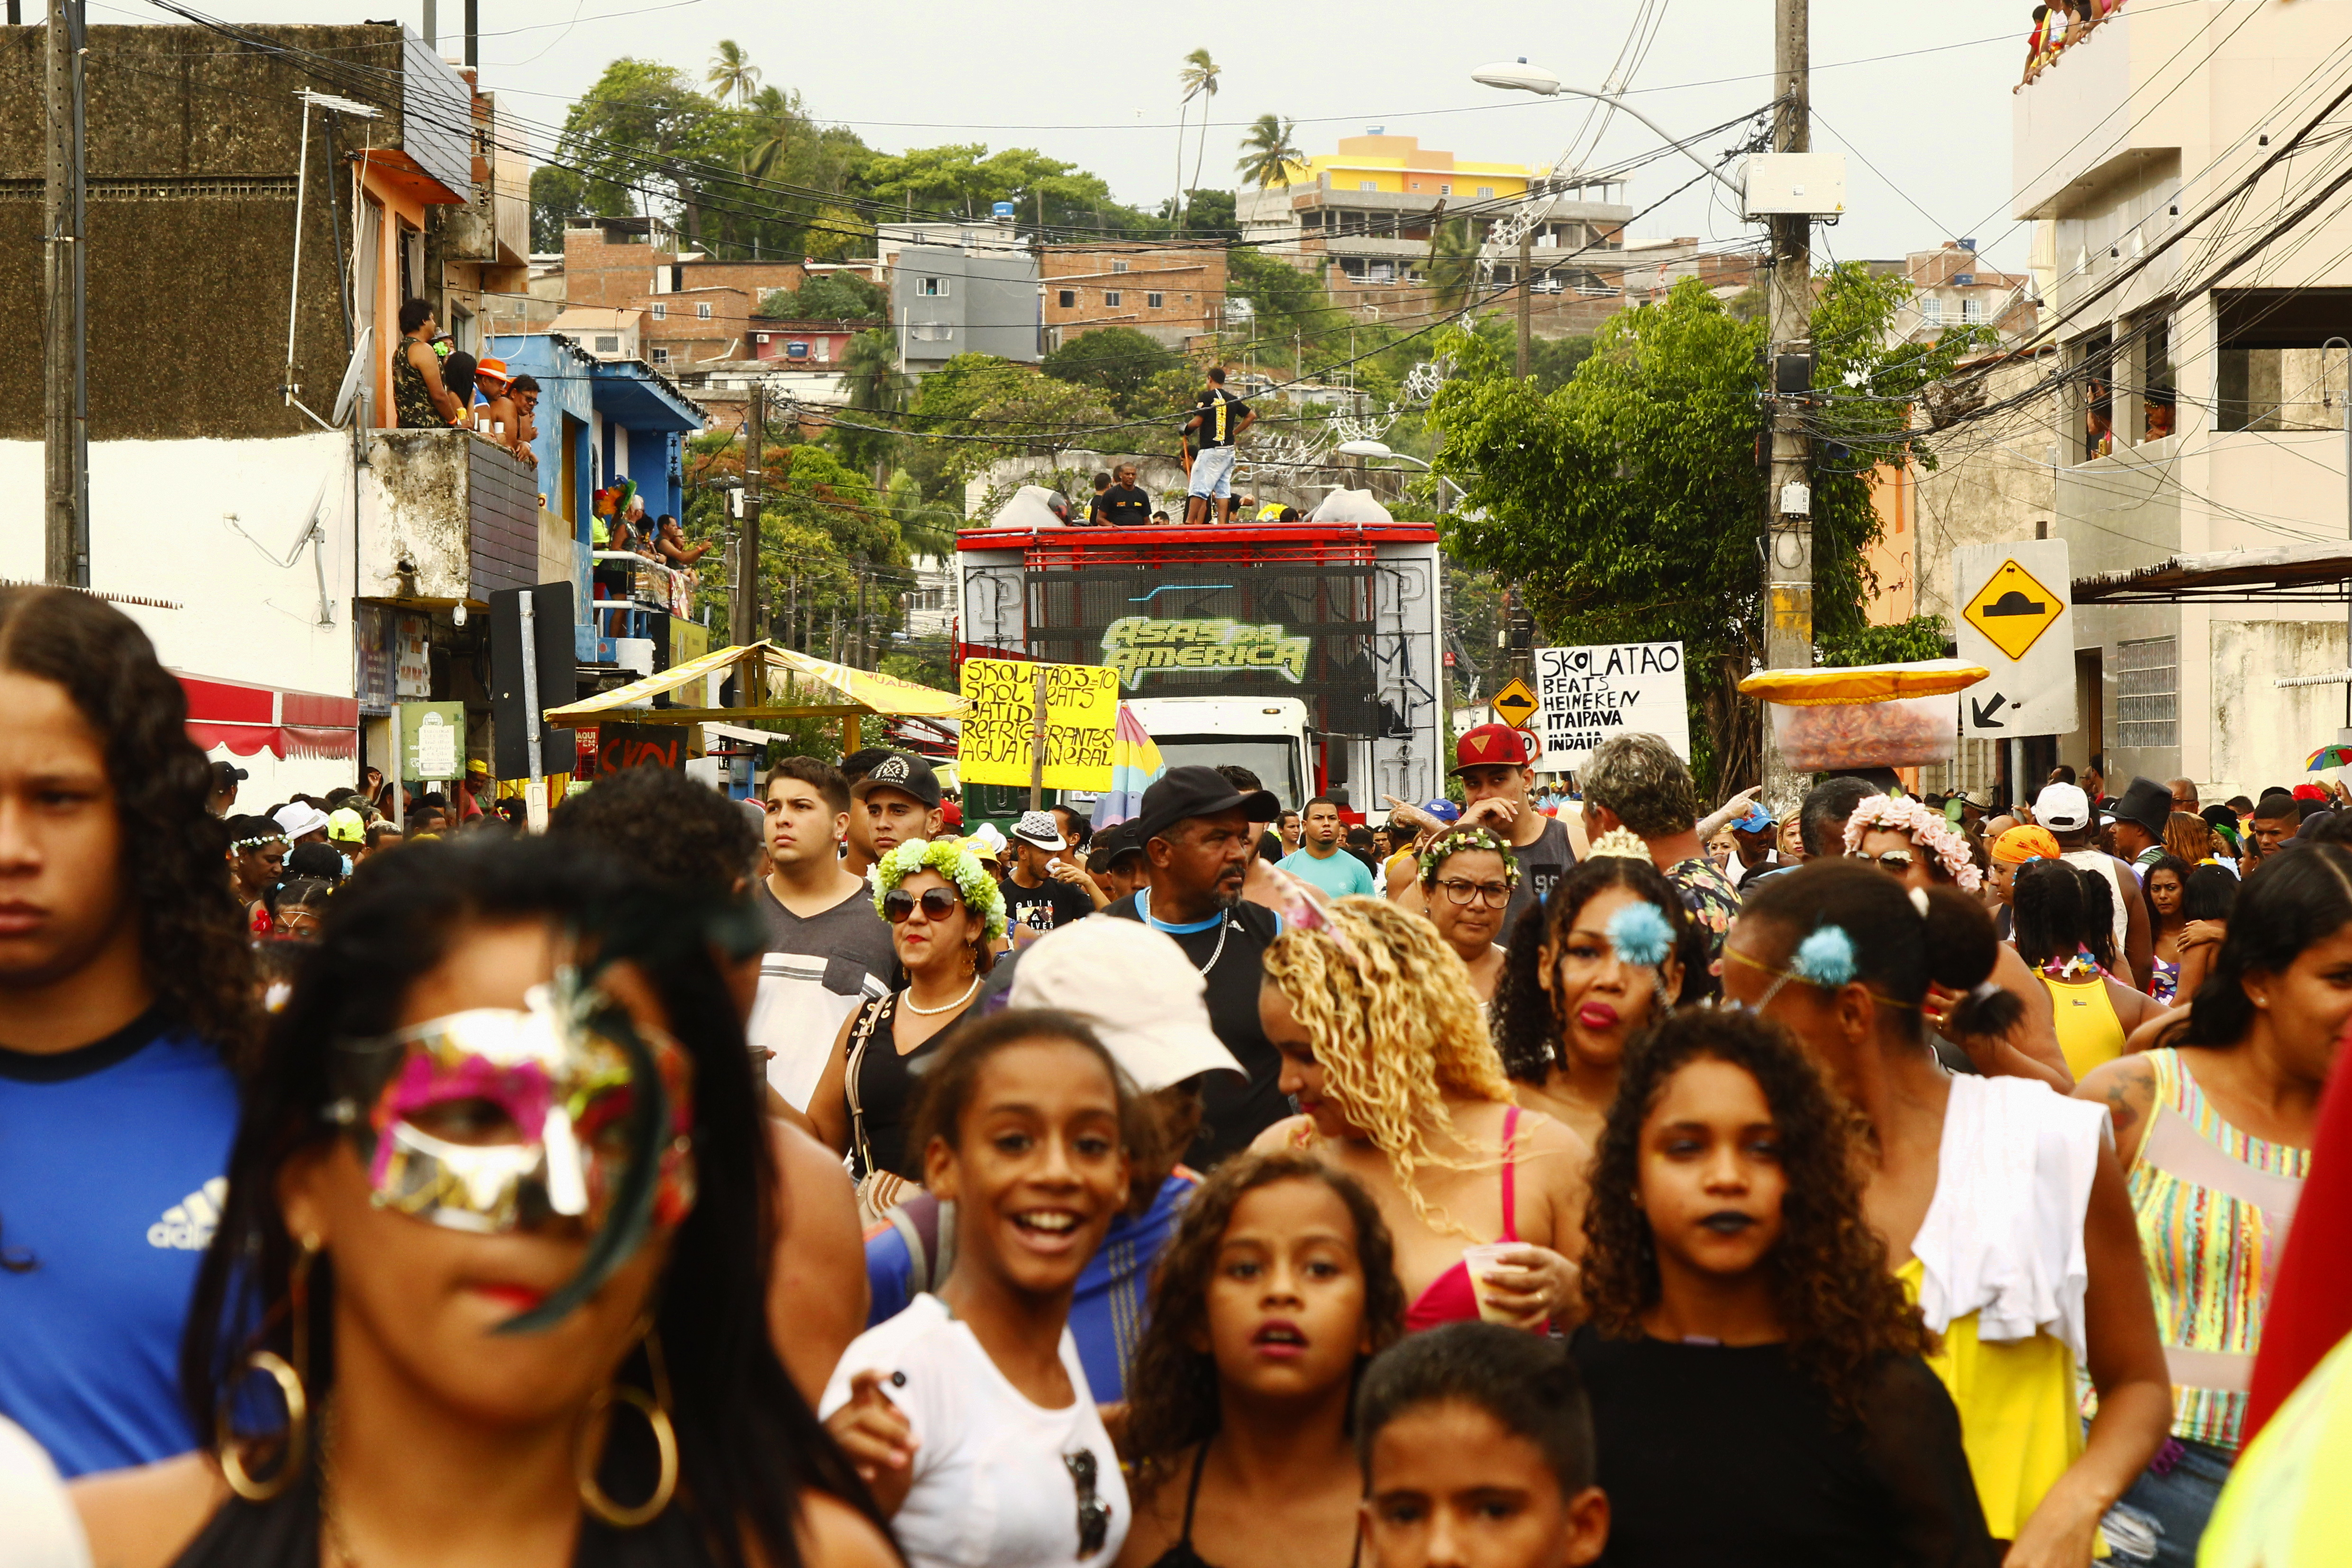 Desfile foi o último suspiro para quem ainda pulsava carnaval. Fotos: Shilton Araújo/DP (Desfile foi o último suspiro para quem ainda pulsava carnaval. Fotos: Shilton Araújo/DP)